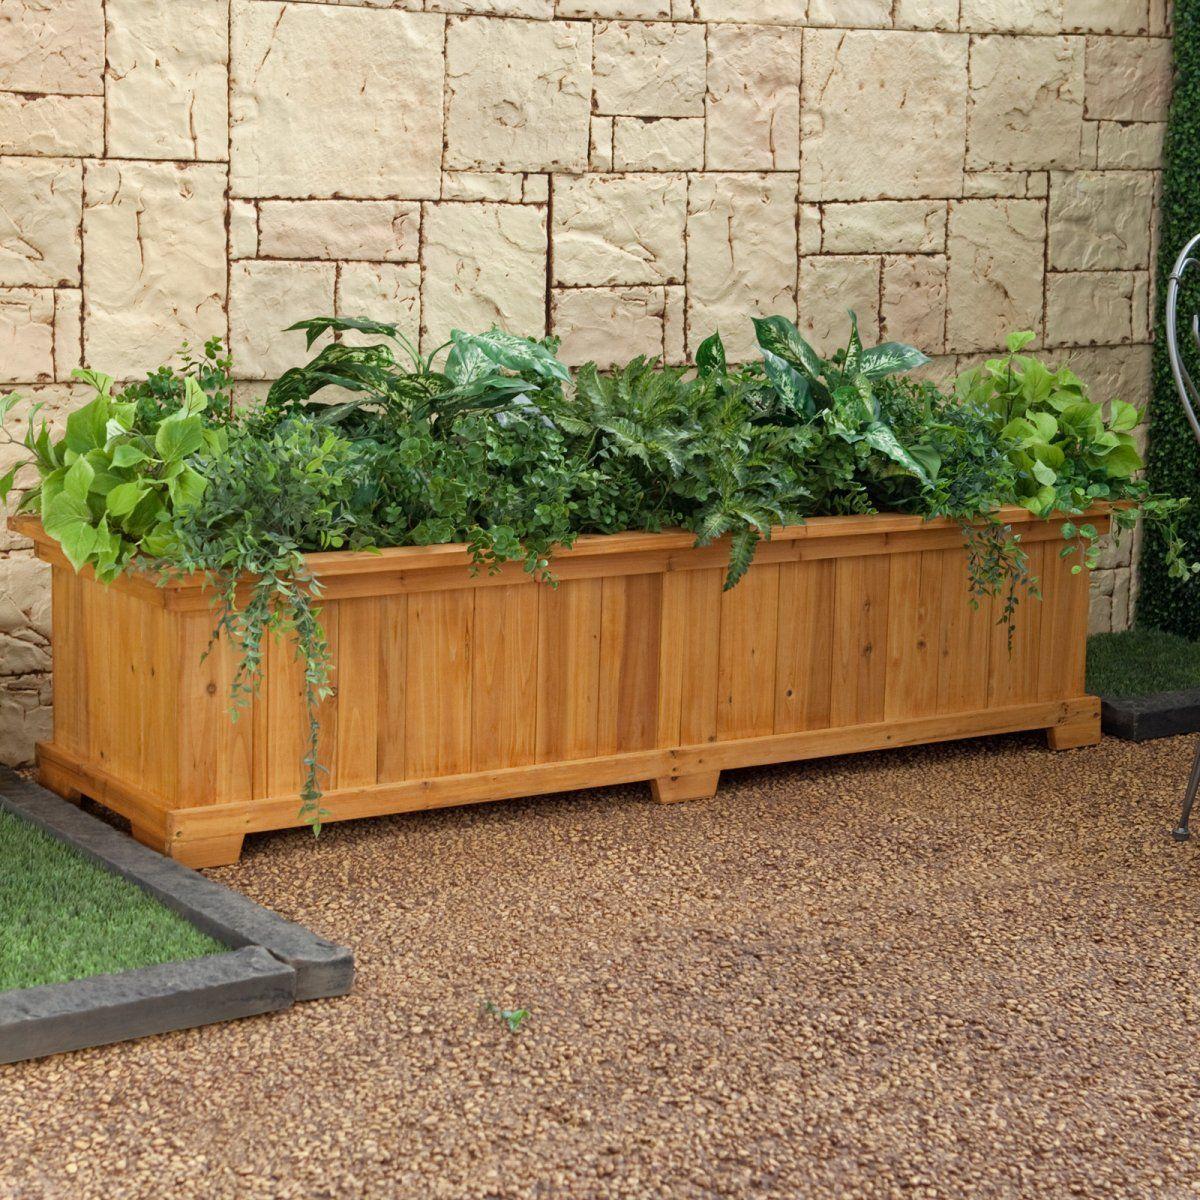 Rectangular Cedar Wood Aster Patio Planter Box Planter